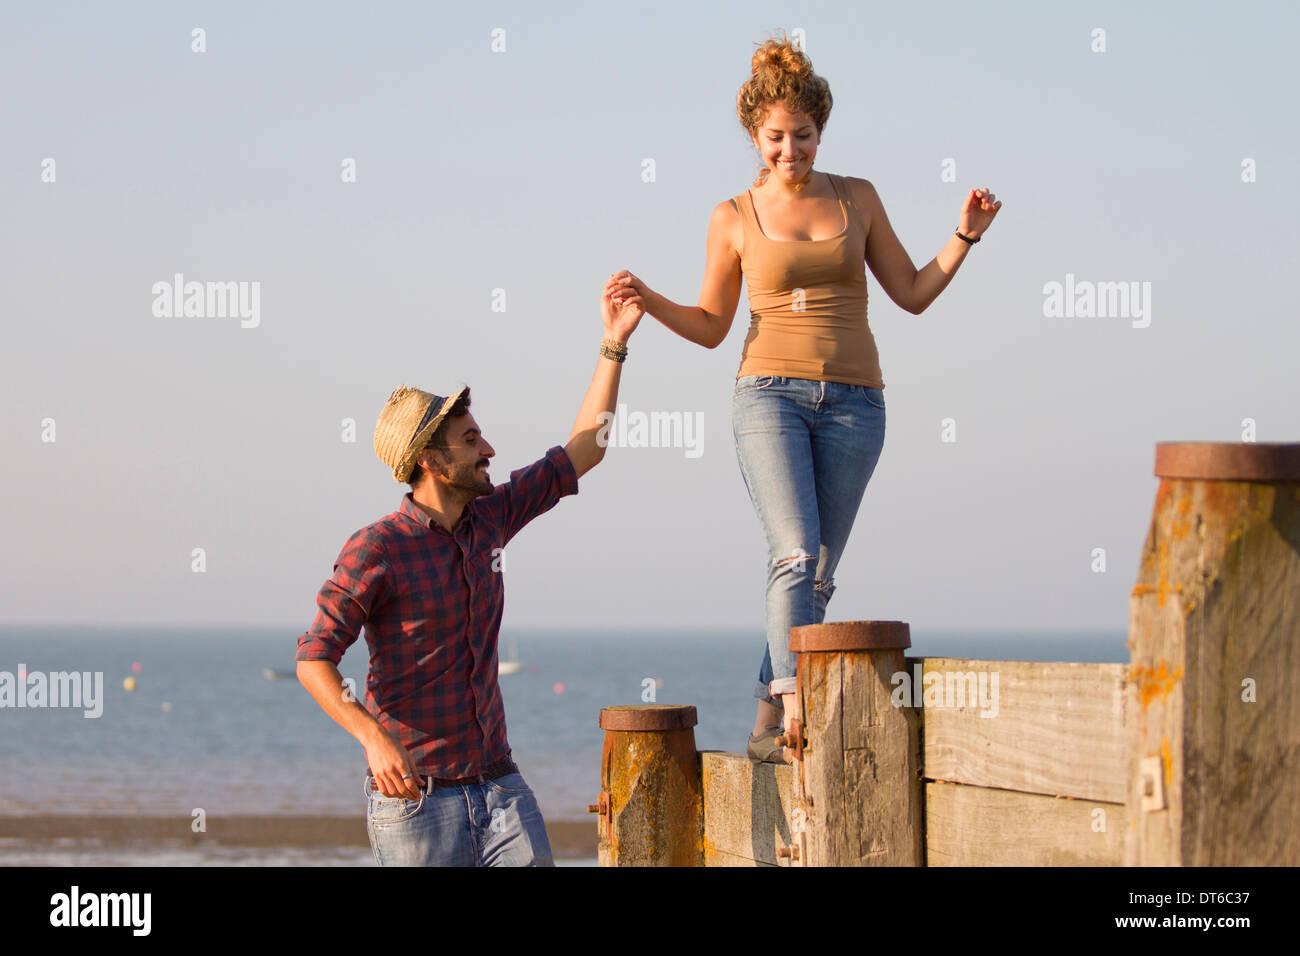 Young woman balancing on groynes holding man's hand - Stock Image